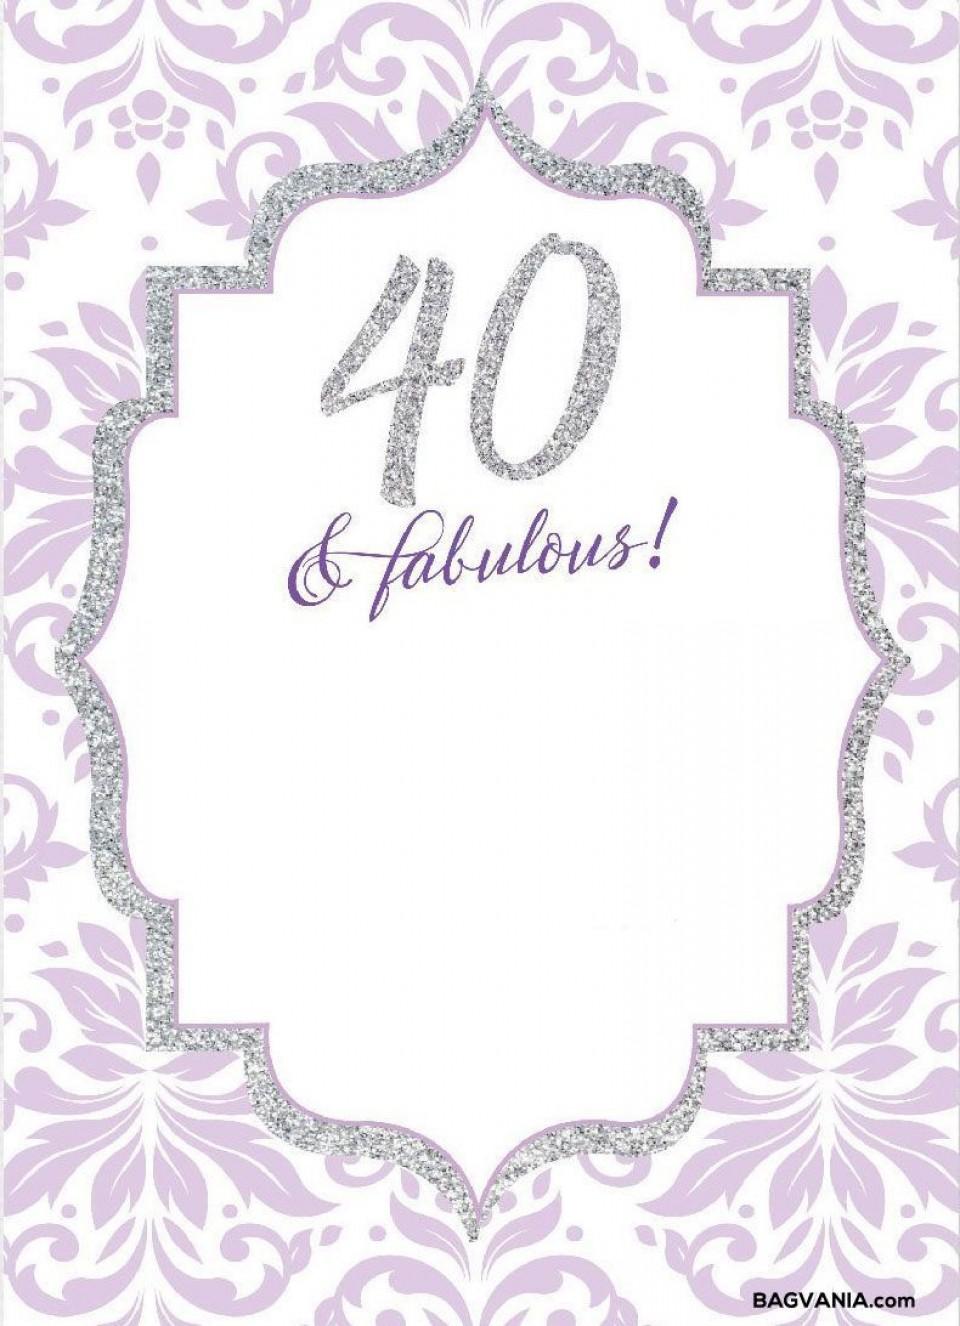 008 Wonderful 40th Birthday Party Invite Template Free Idea 960